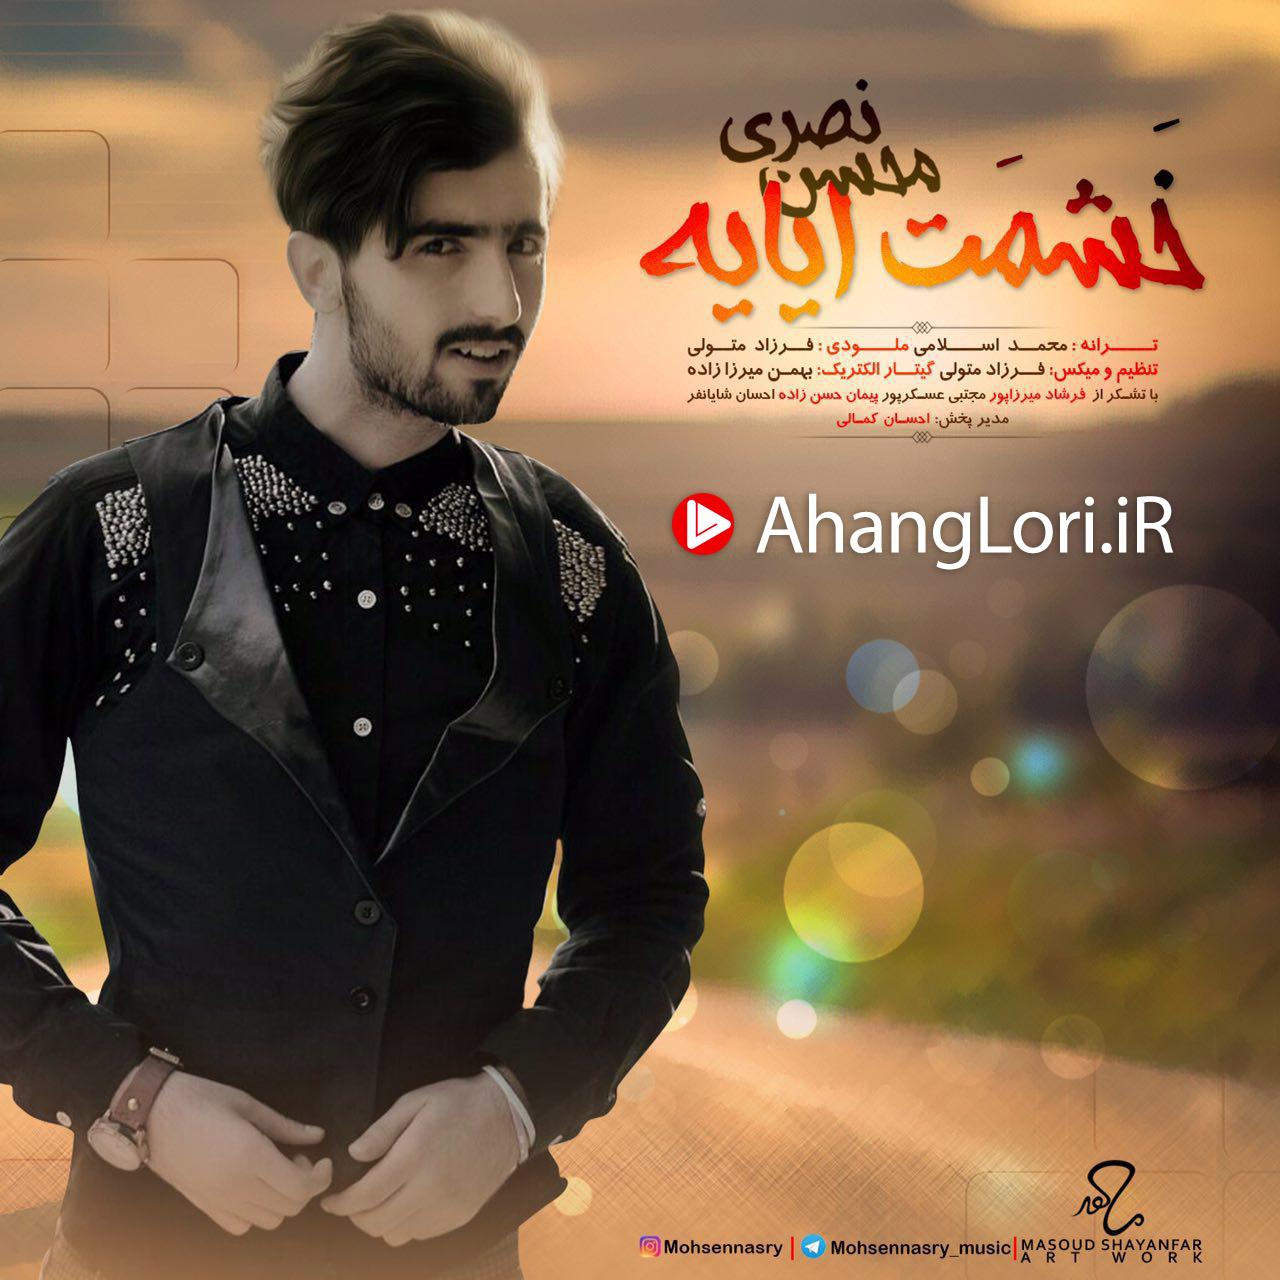 photo_2017-02-28_00-26-30 دانلود آهنگ جدید محسن نصری به نام خشمت ایایه